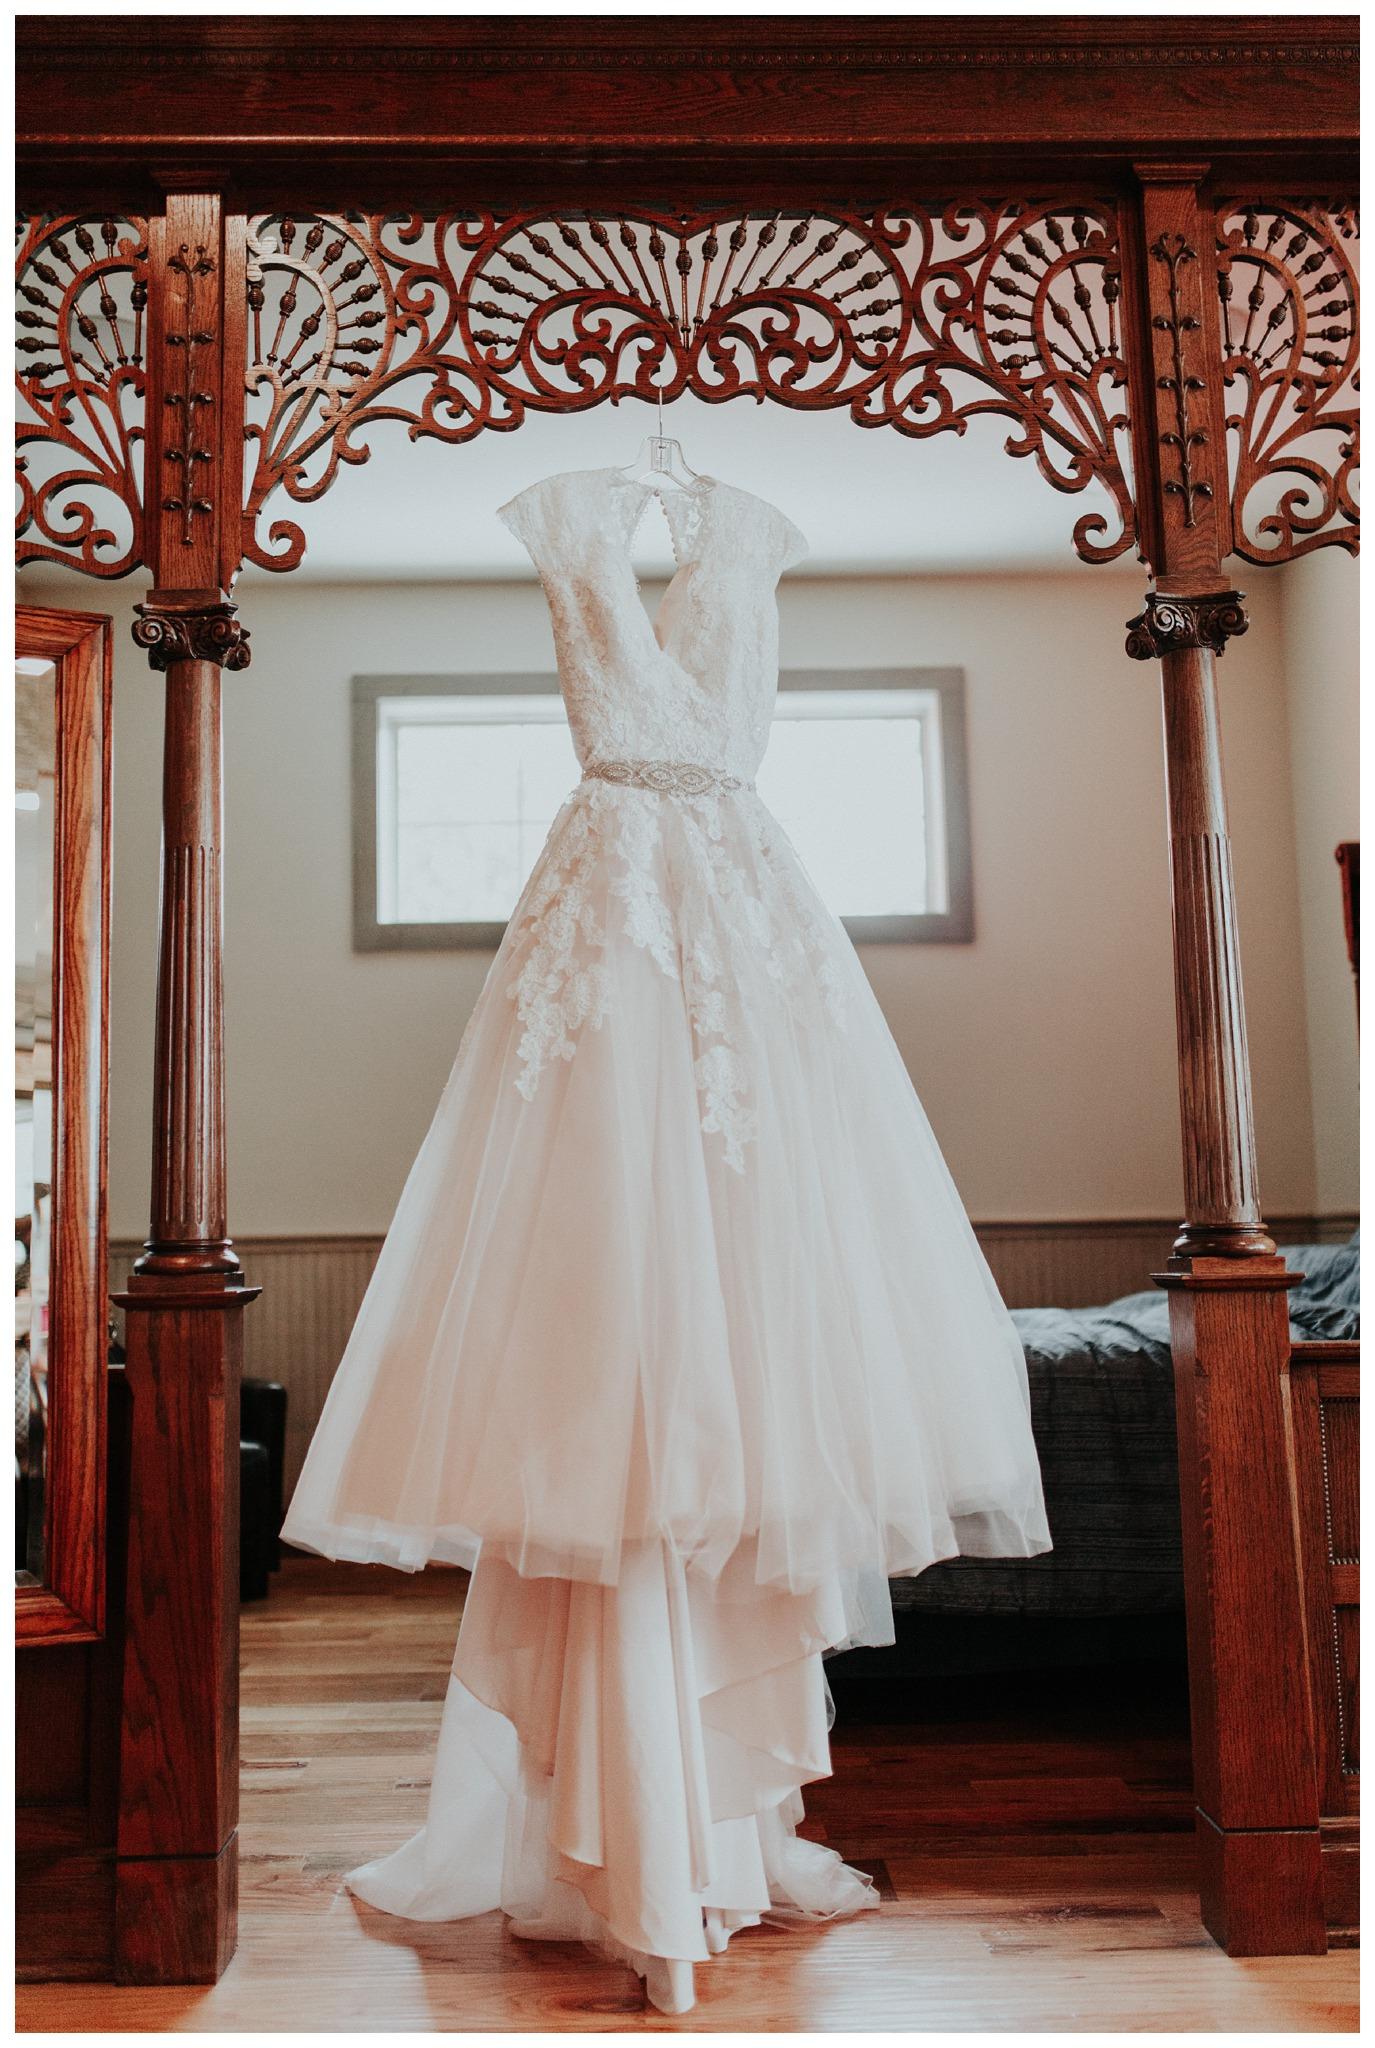 Oak Knoll Ranch Wedding - Madeleine Frost - Angela & Nick -5971.jpg